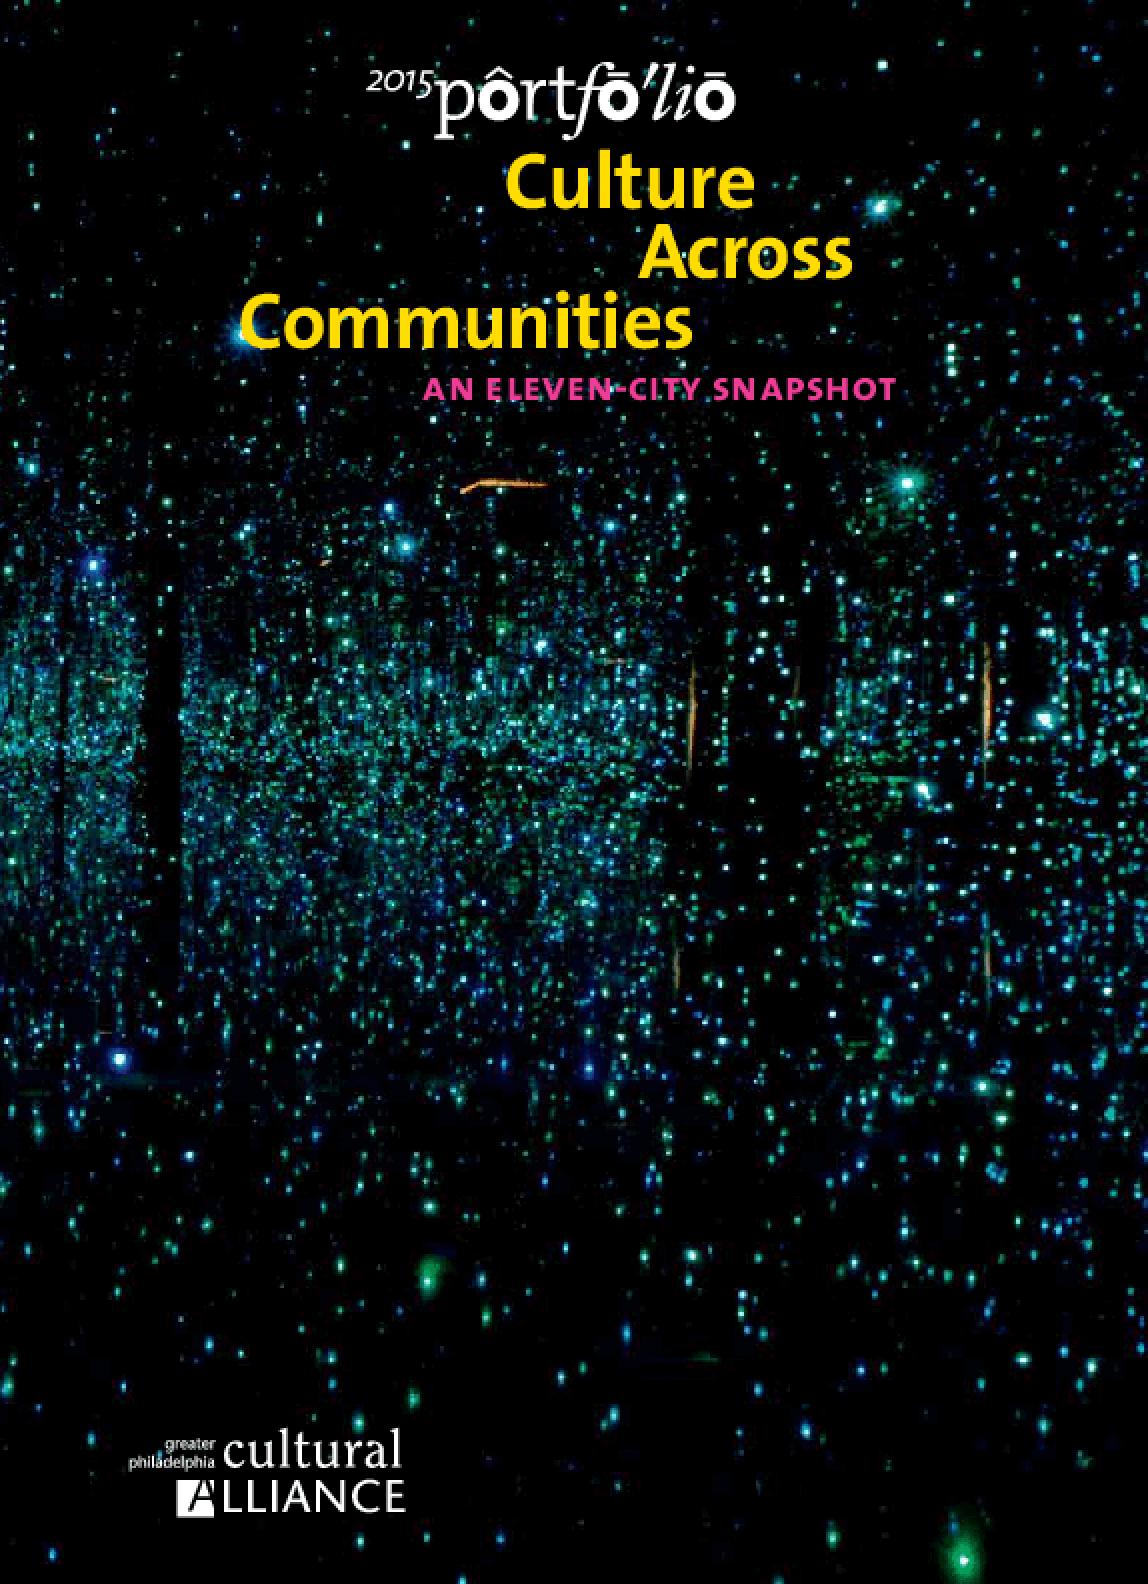 2015 Portfolio: Culture Across Communities, an Eleven-City Snapshot